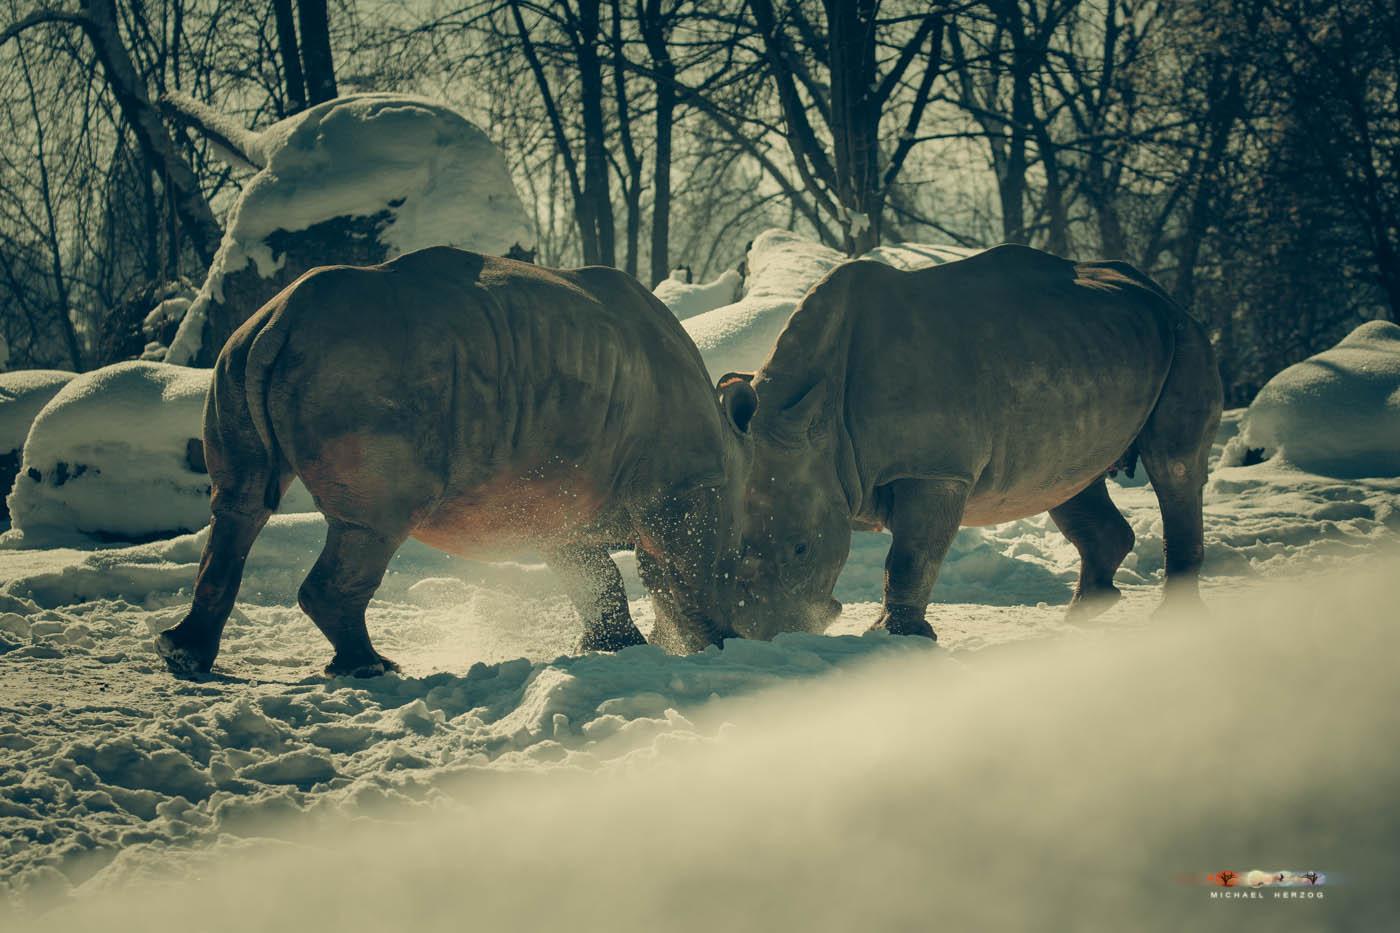 Zoo_Salzburg_MichaelHerzog-7450.jpg